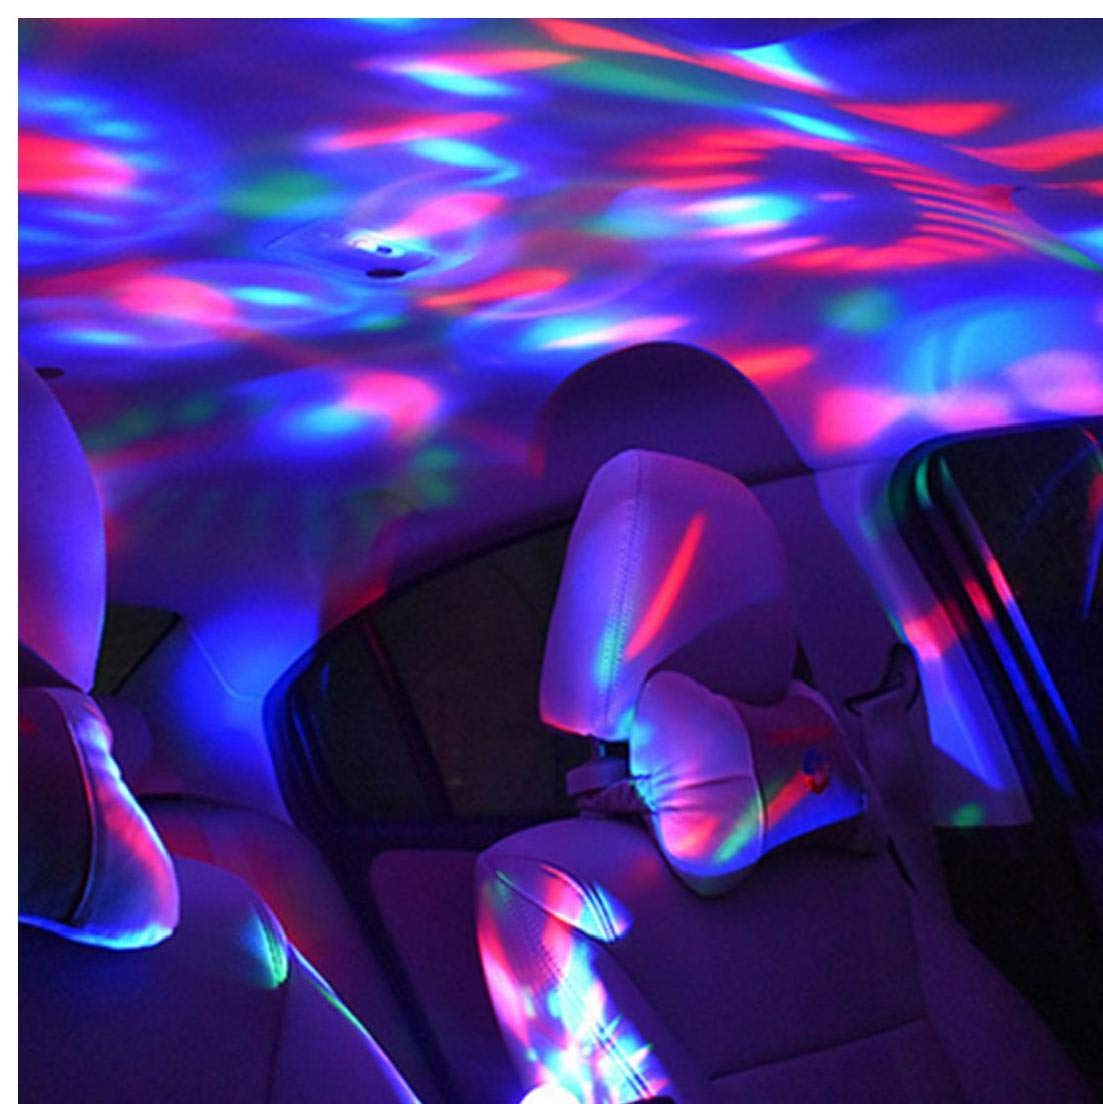 2pcs llev/ó la luz del coche de control de voz Mini USB inal/ámbrico kit de iluminaci/ón del interior del coche coche estilo interior luz de la decoraci/ón del ambiente LED en color de 7 Conexi/ón mini USB